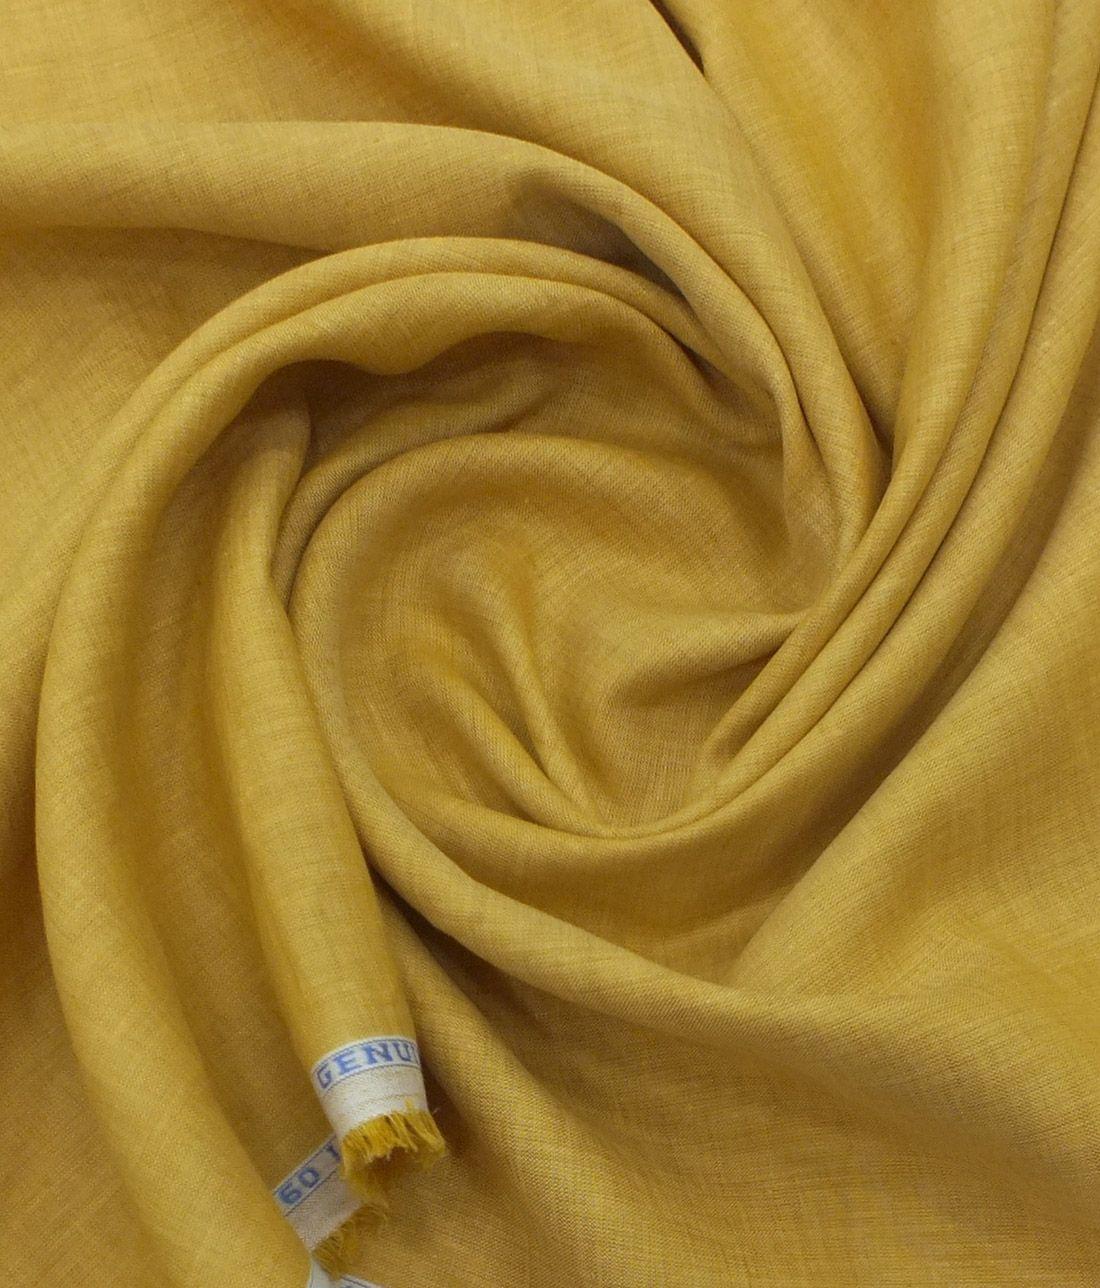 Linen Club Butterscotch Beige 100 Pure Linen 60 Lea Self Design Shirt Fabric 1 60 M Club Shirts Pure Linen Pure Products